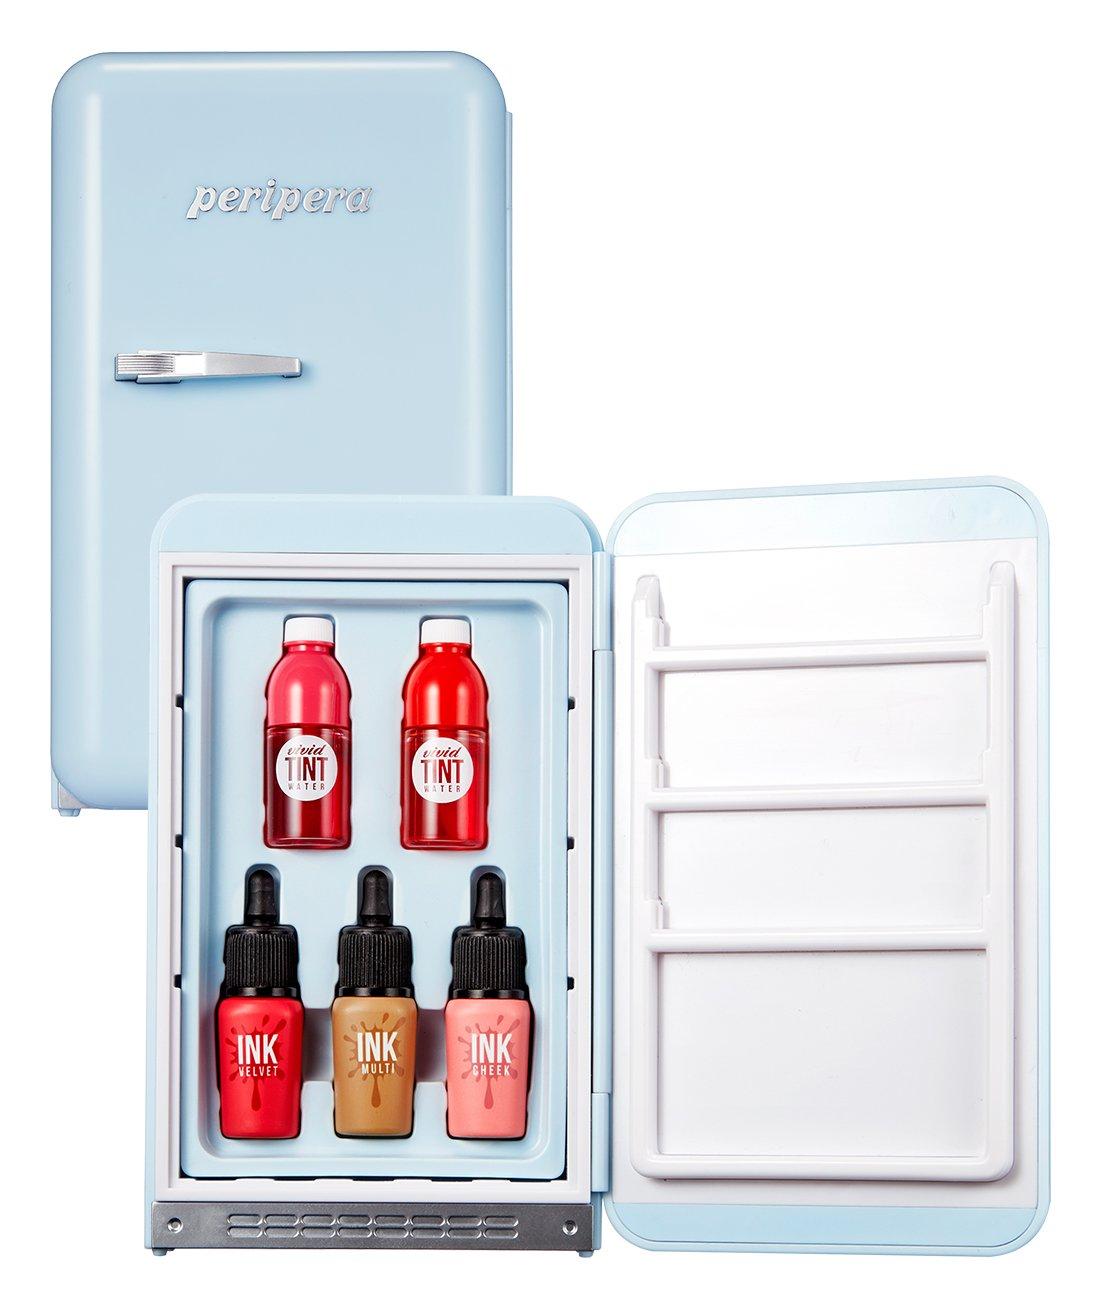 Peripera Peri's Mini Fridge Training Material Daldal Factory 0.12 x 0.07, 0.09 x 0.10 Ounce 001 Daldal Pink CLIO